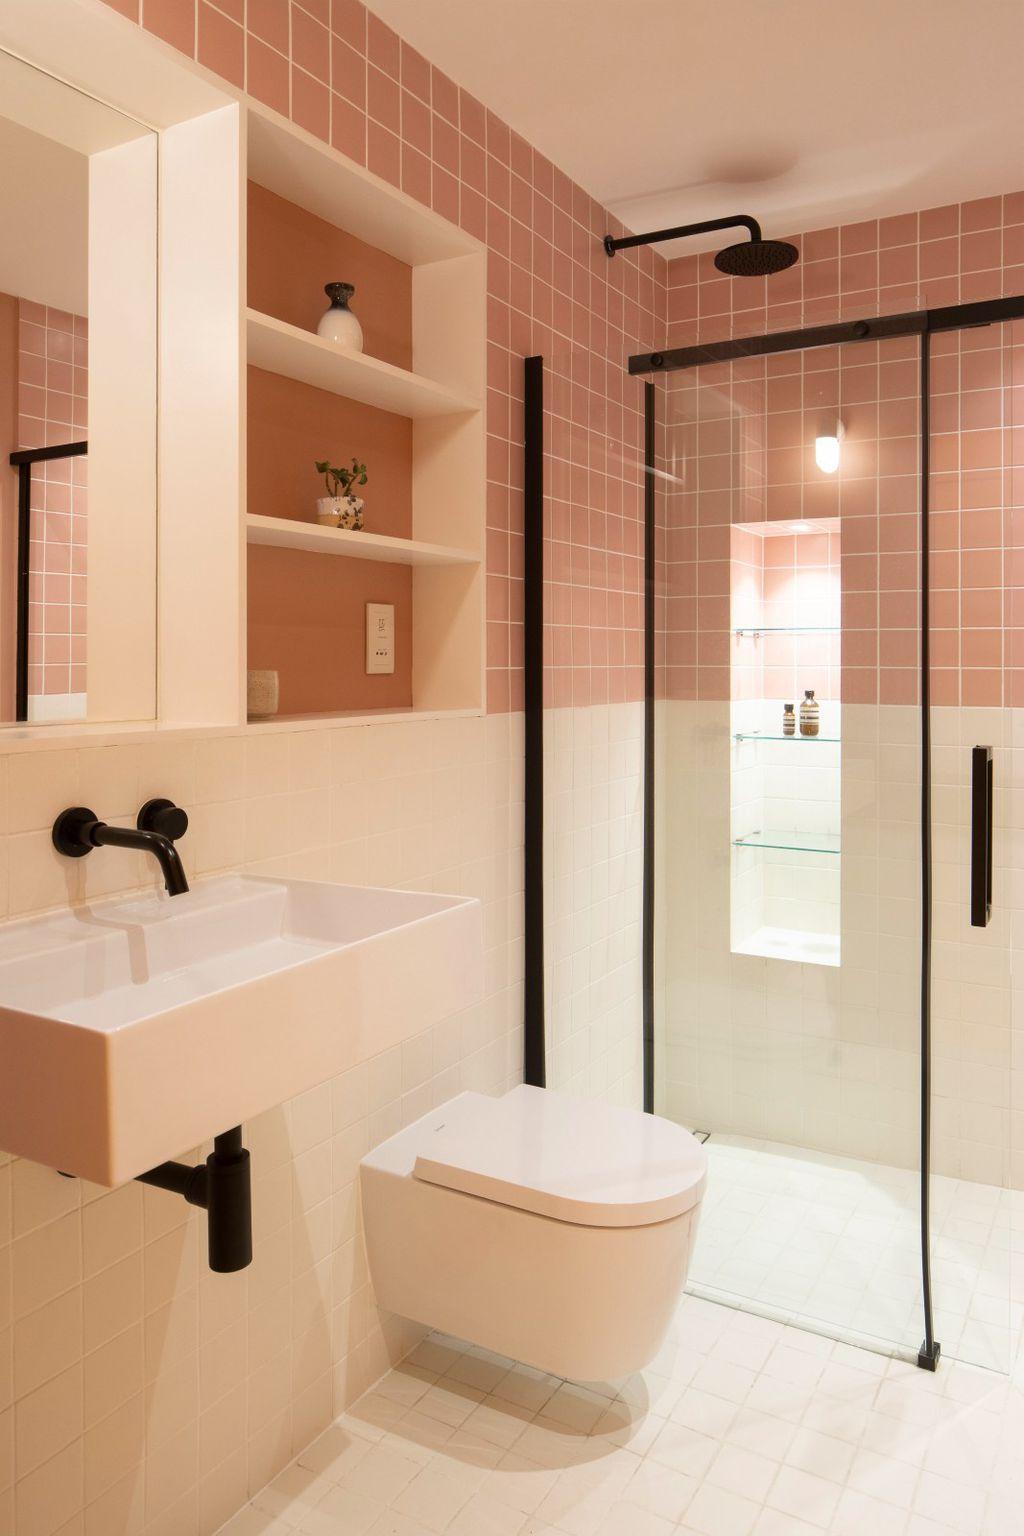 Walk-in tuš u maloj kupaonici - 12